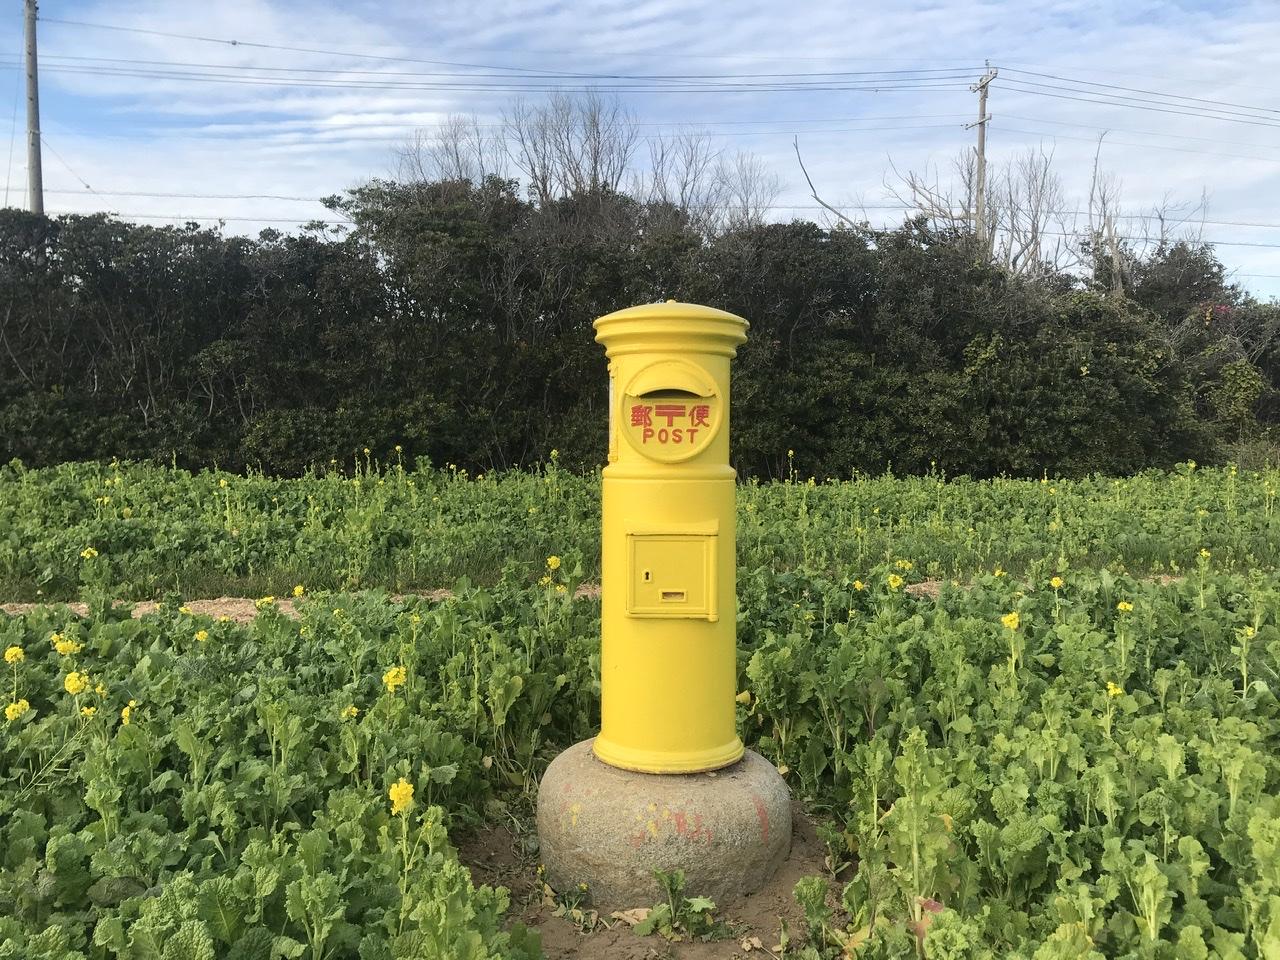 関西 菜の花 畑